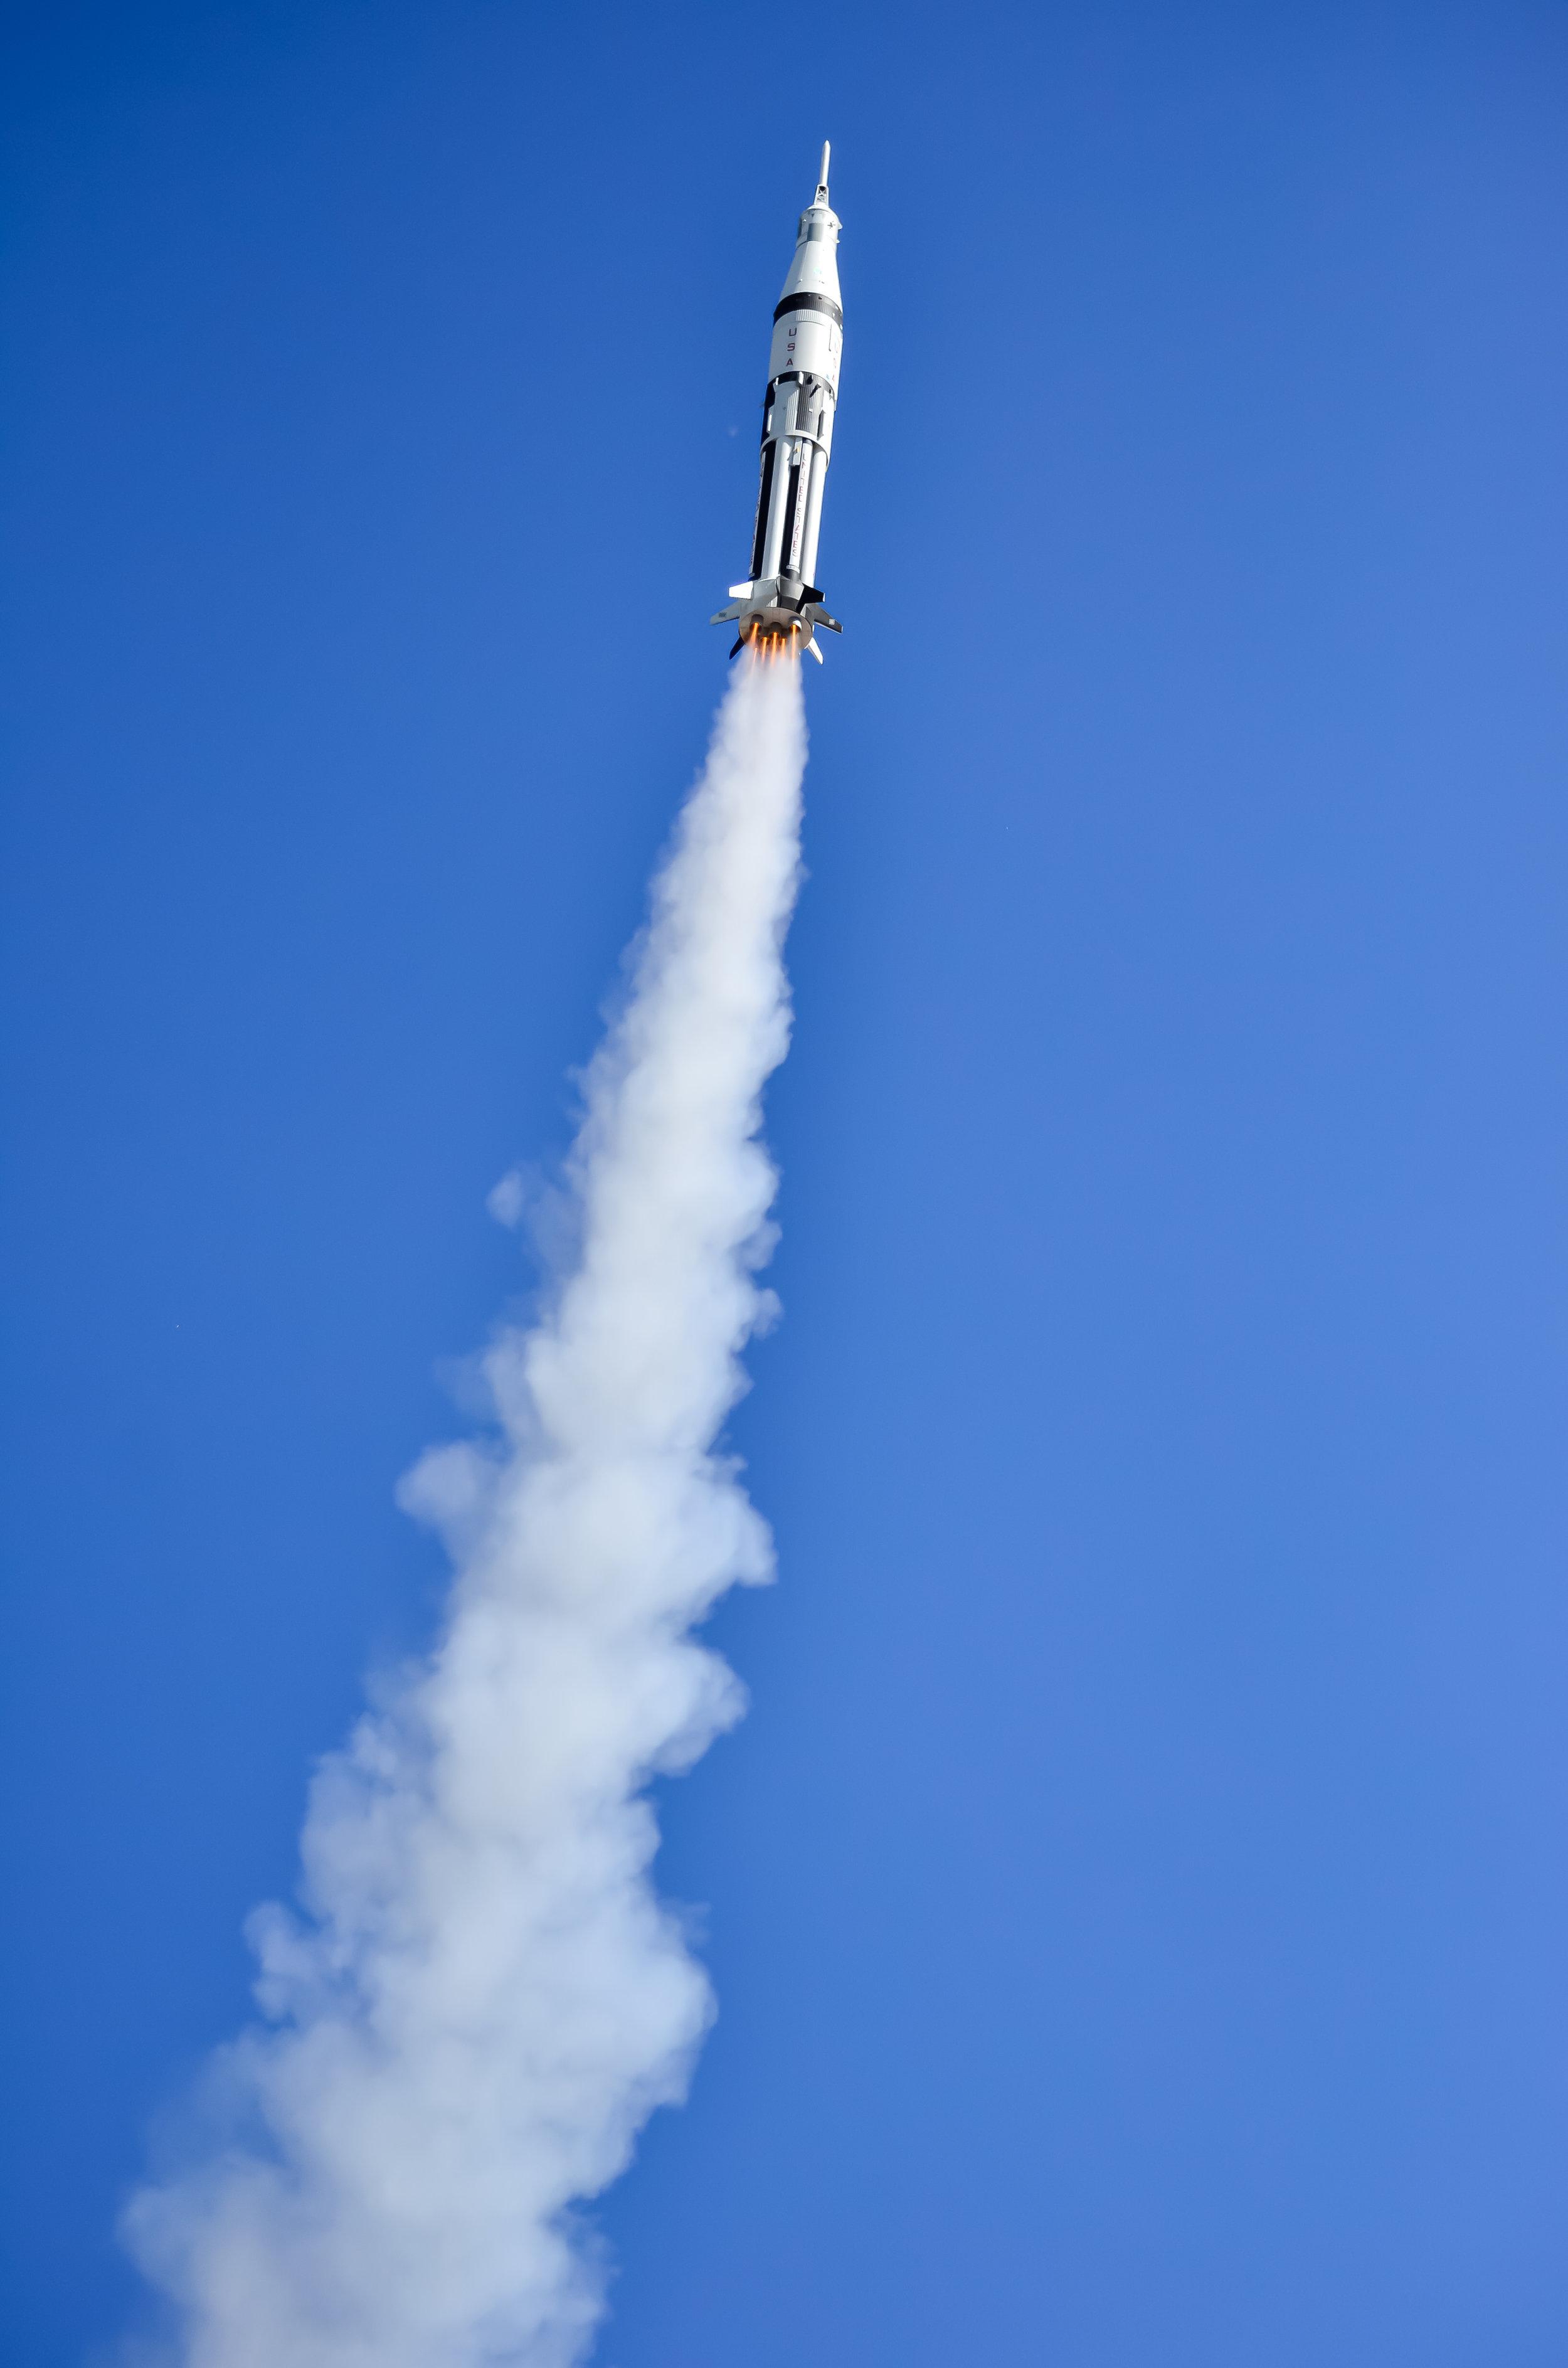 LIITLE JOE II MISSION A04 prototype liftoff / Старт прототипу  LIITLE JOE II MISSION A04. Model builder:NOWAK, Michael / ЗбудованоNOWAK, Michael